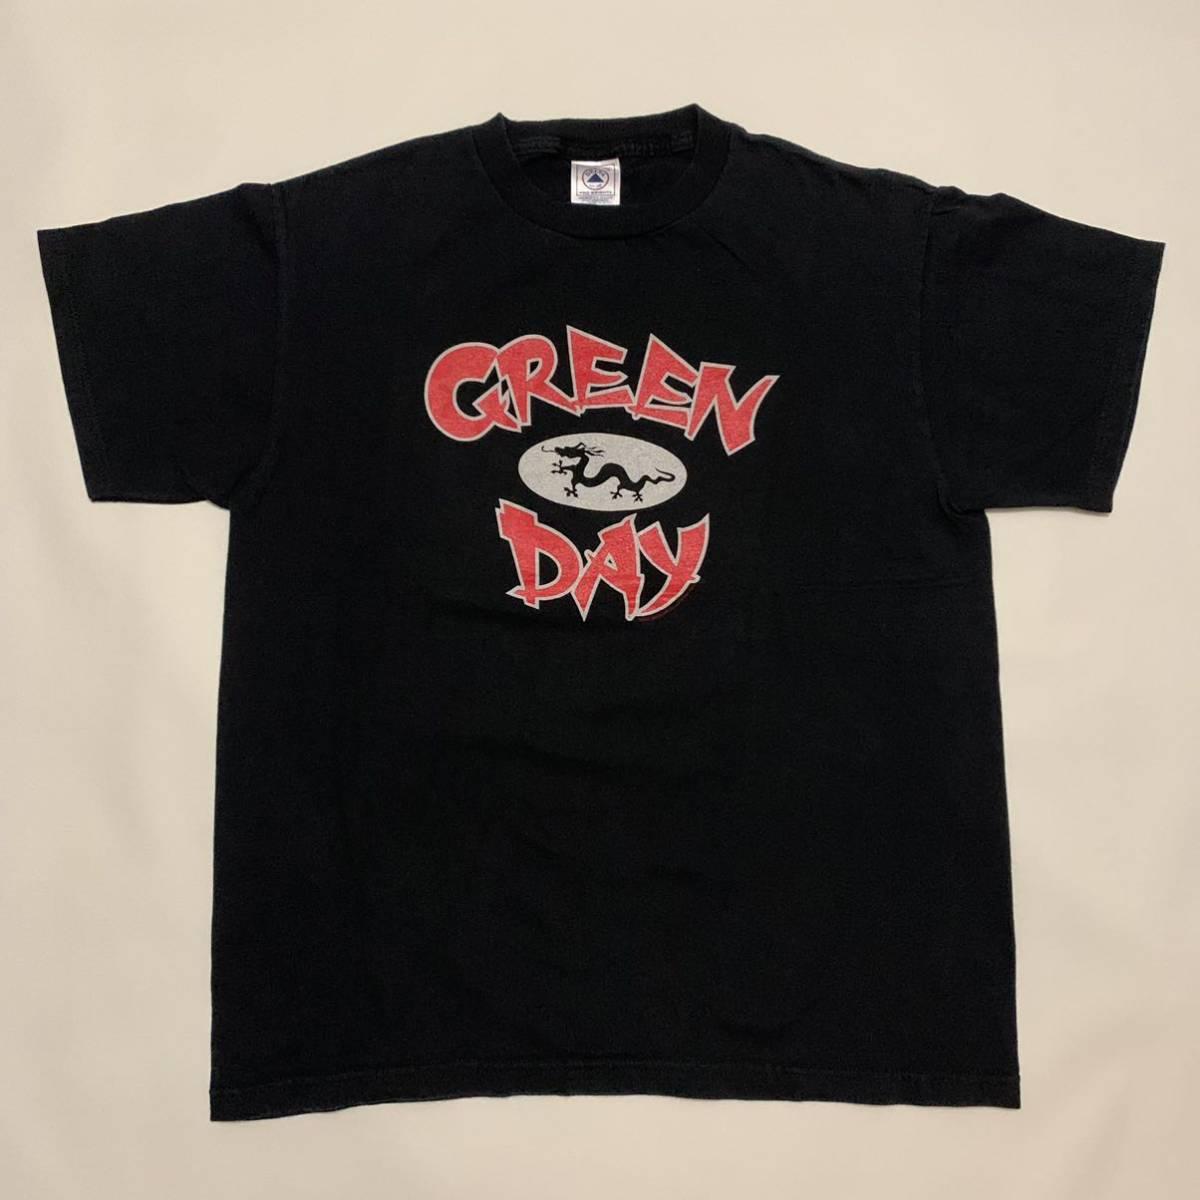 00s GREEN DAY POP DISASTER ツアー Tシャツ ブラック 黒 USA製 /ビンテージ 80s STARTREK STAR WARS バンT NIRVANA レッチリ バンド